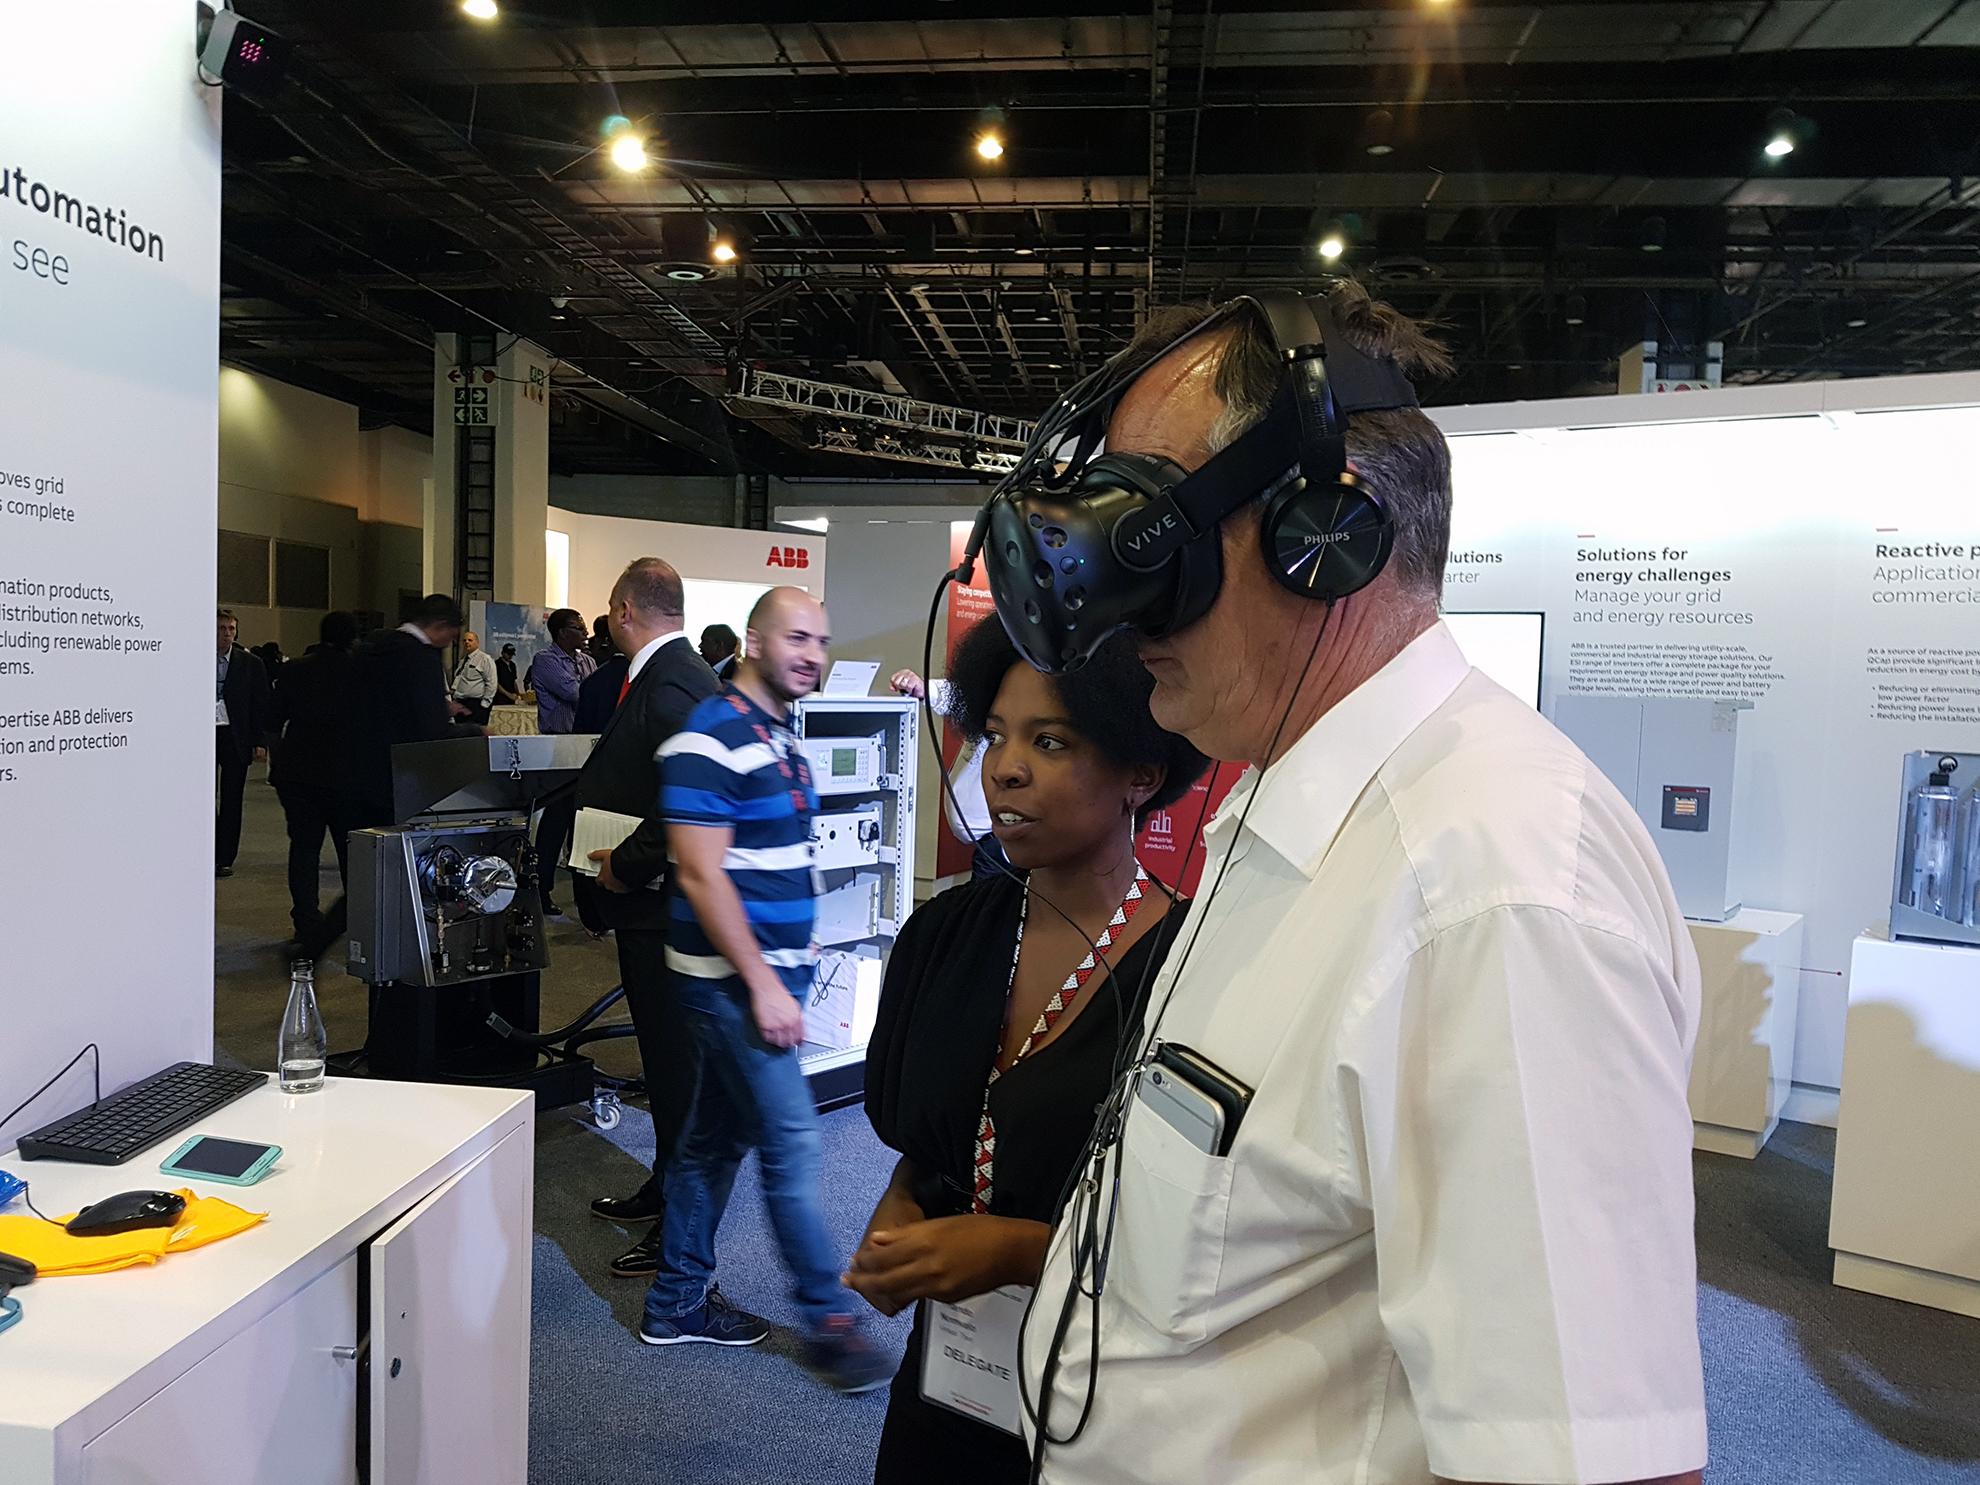 vr360-virtual-reality